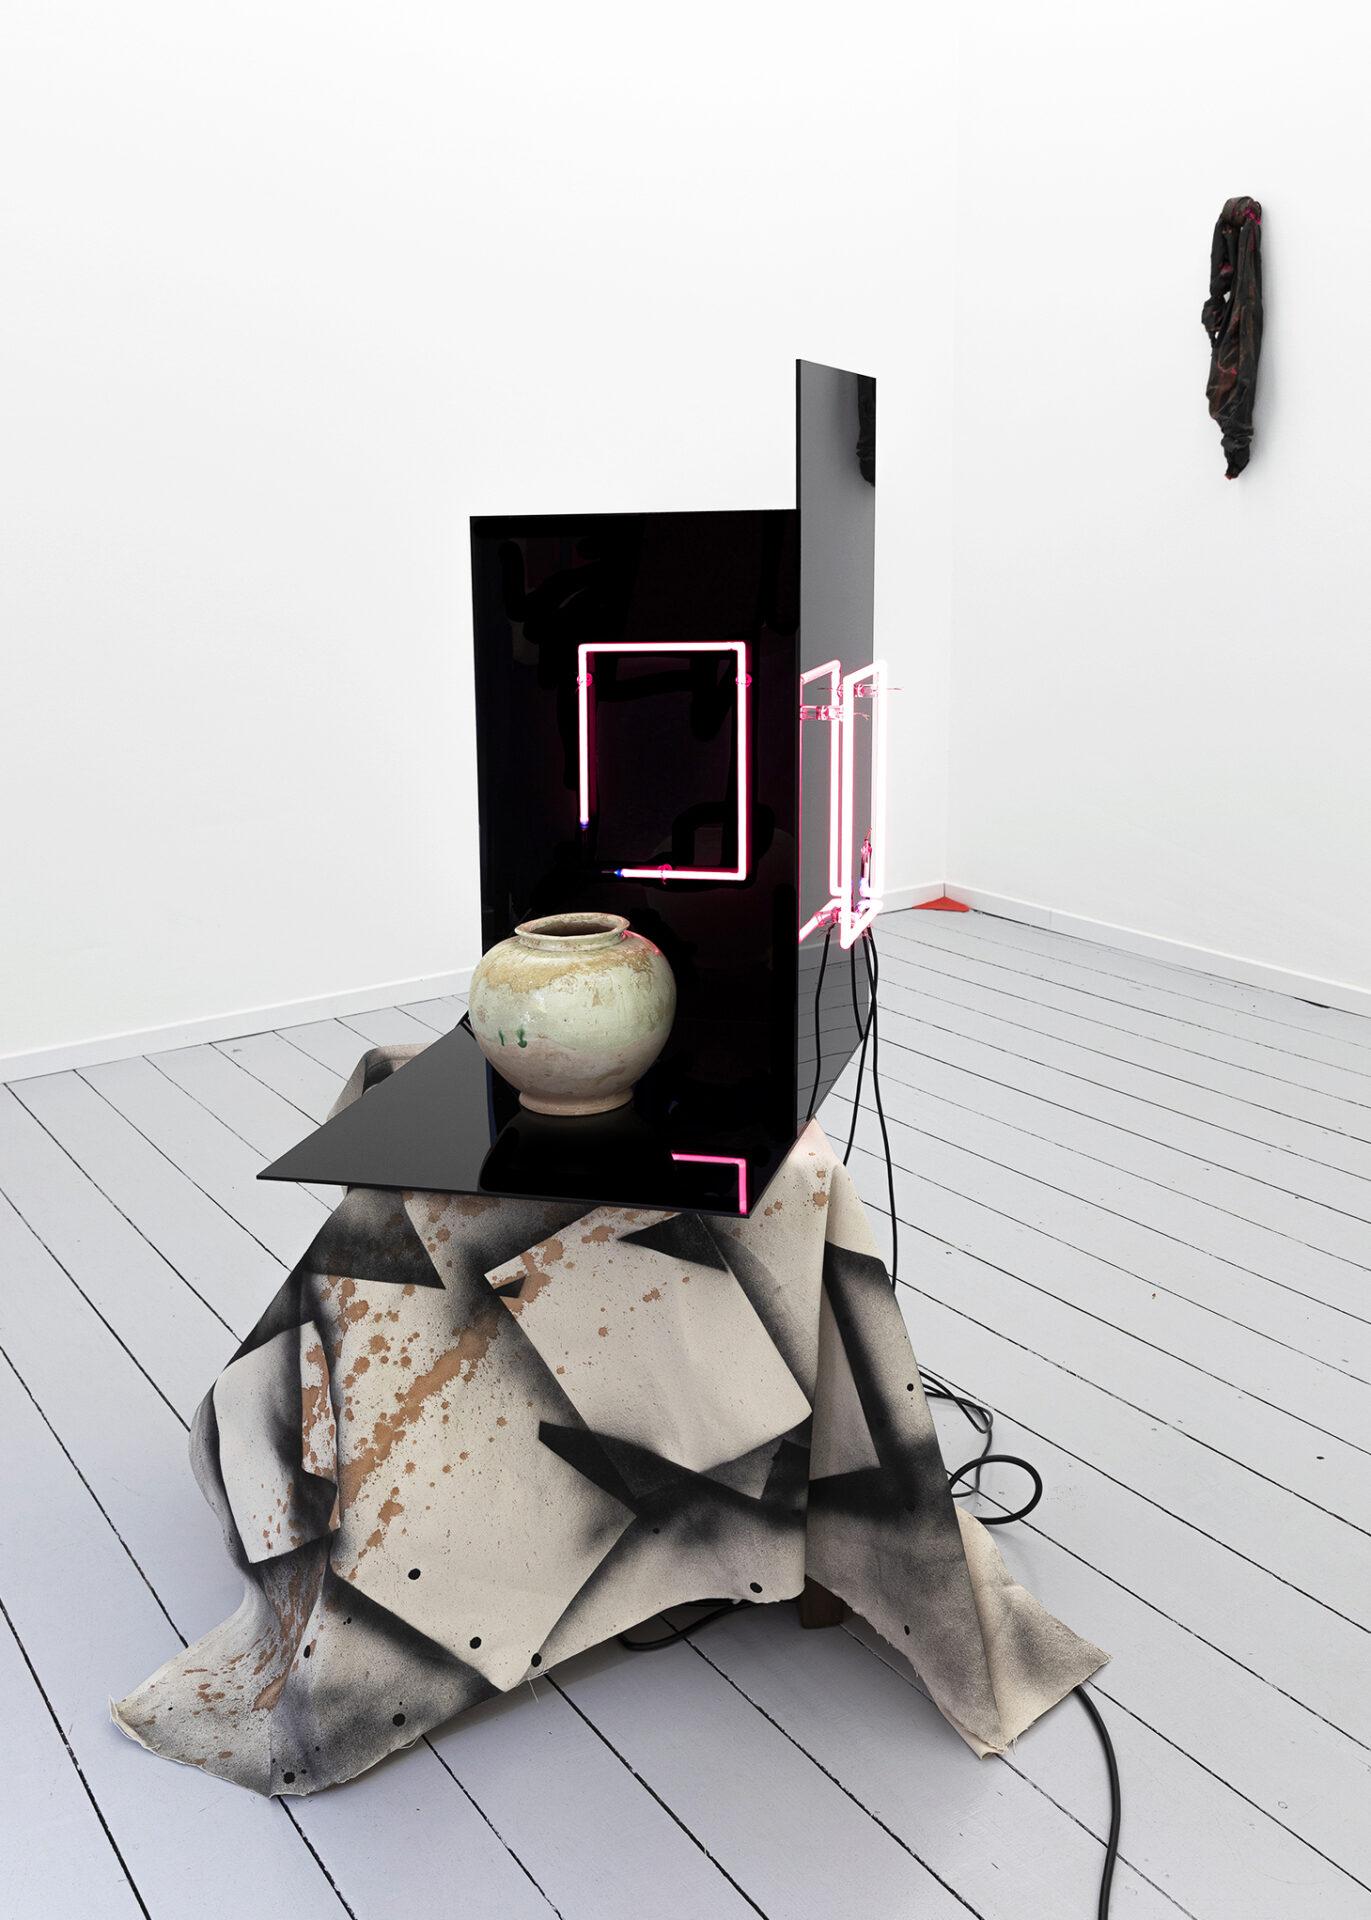 Anna Friedel | Once upon a time - Requiem for my HK | 2019 |Bild mit drei Knoten |2011 | Photo Johannes Pöttgens